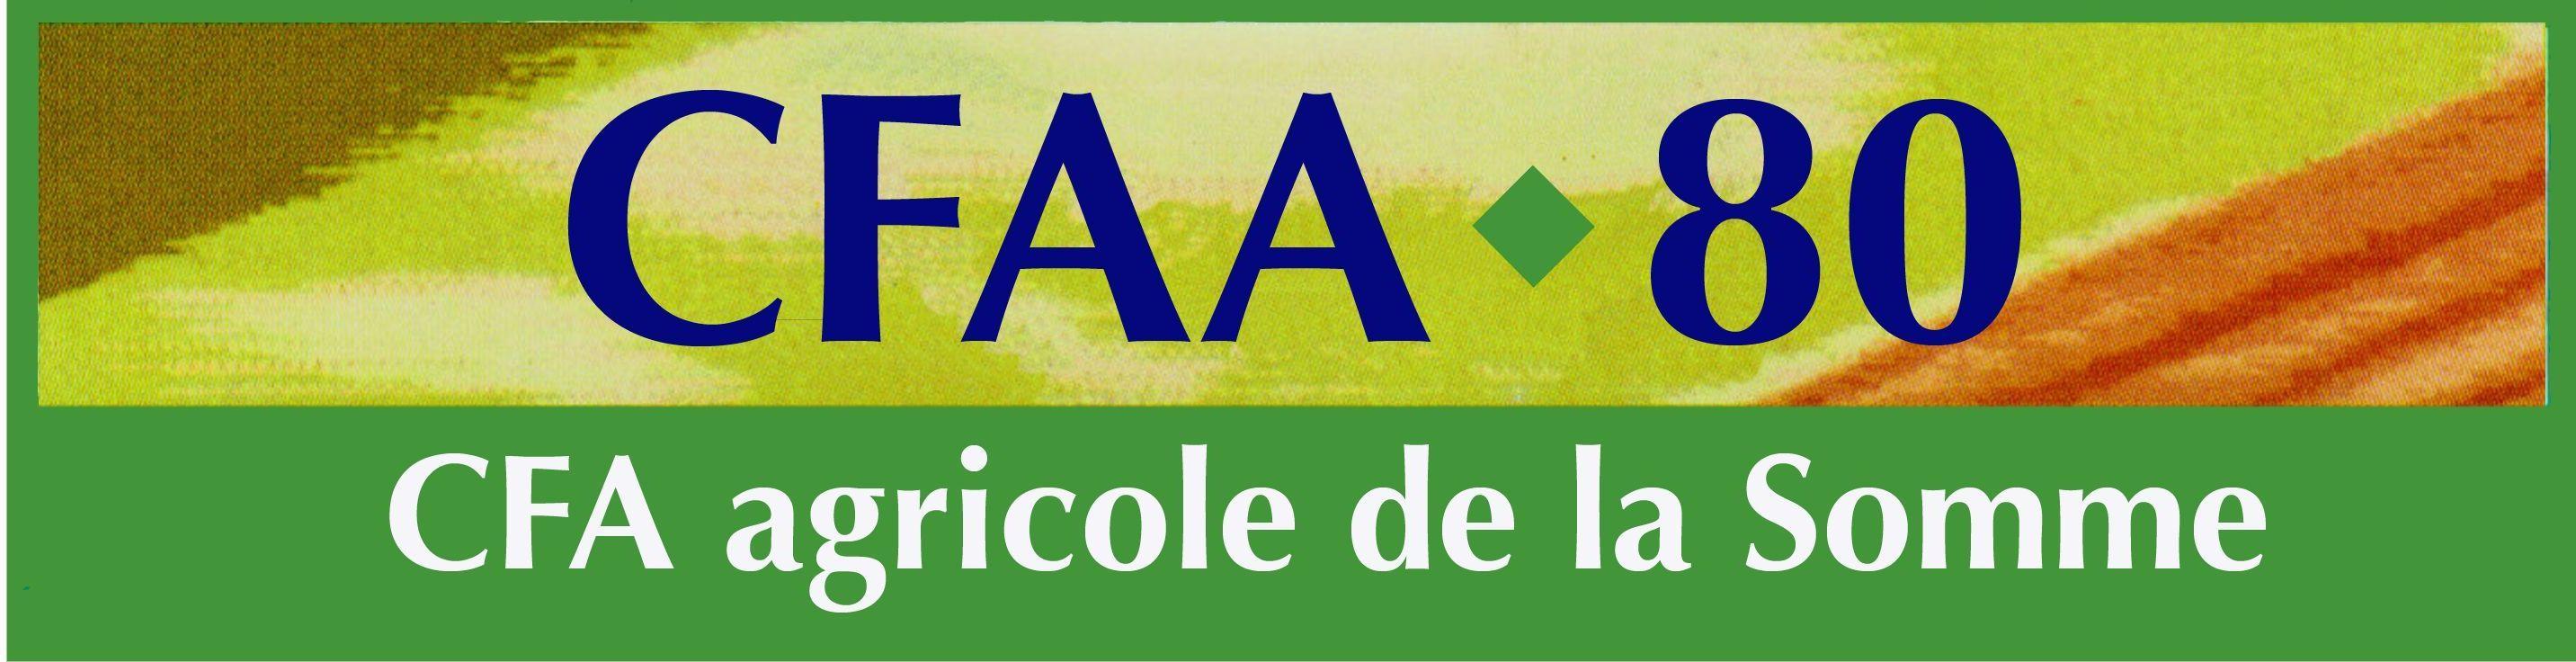 CFA agricole de la Somme - CFAA80